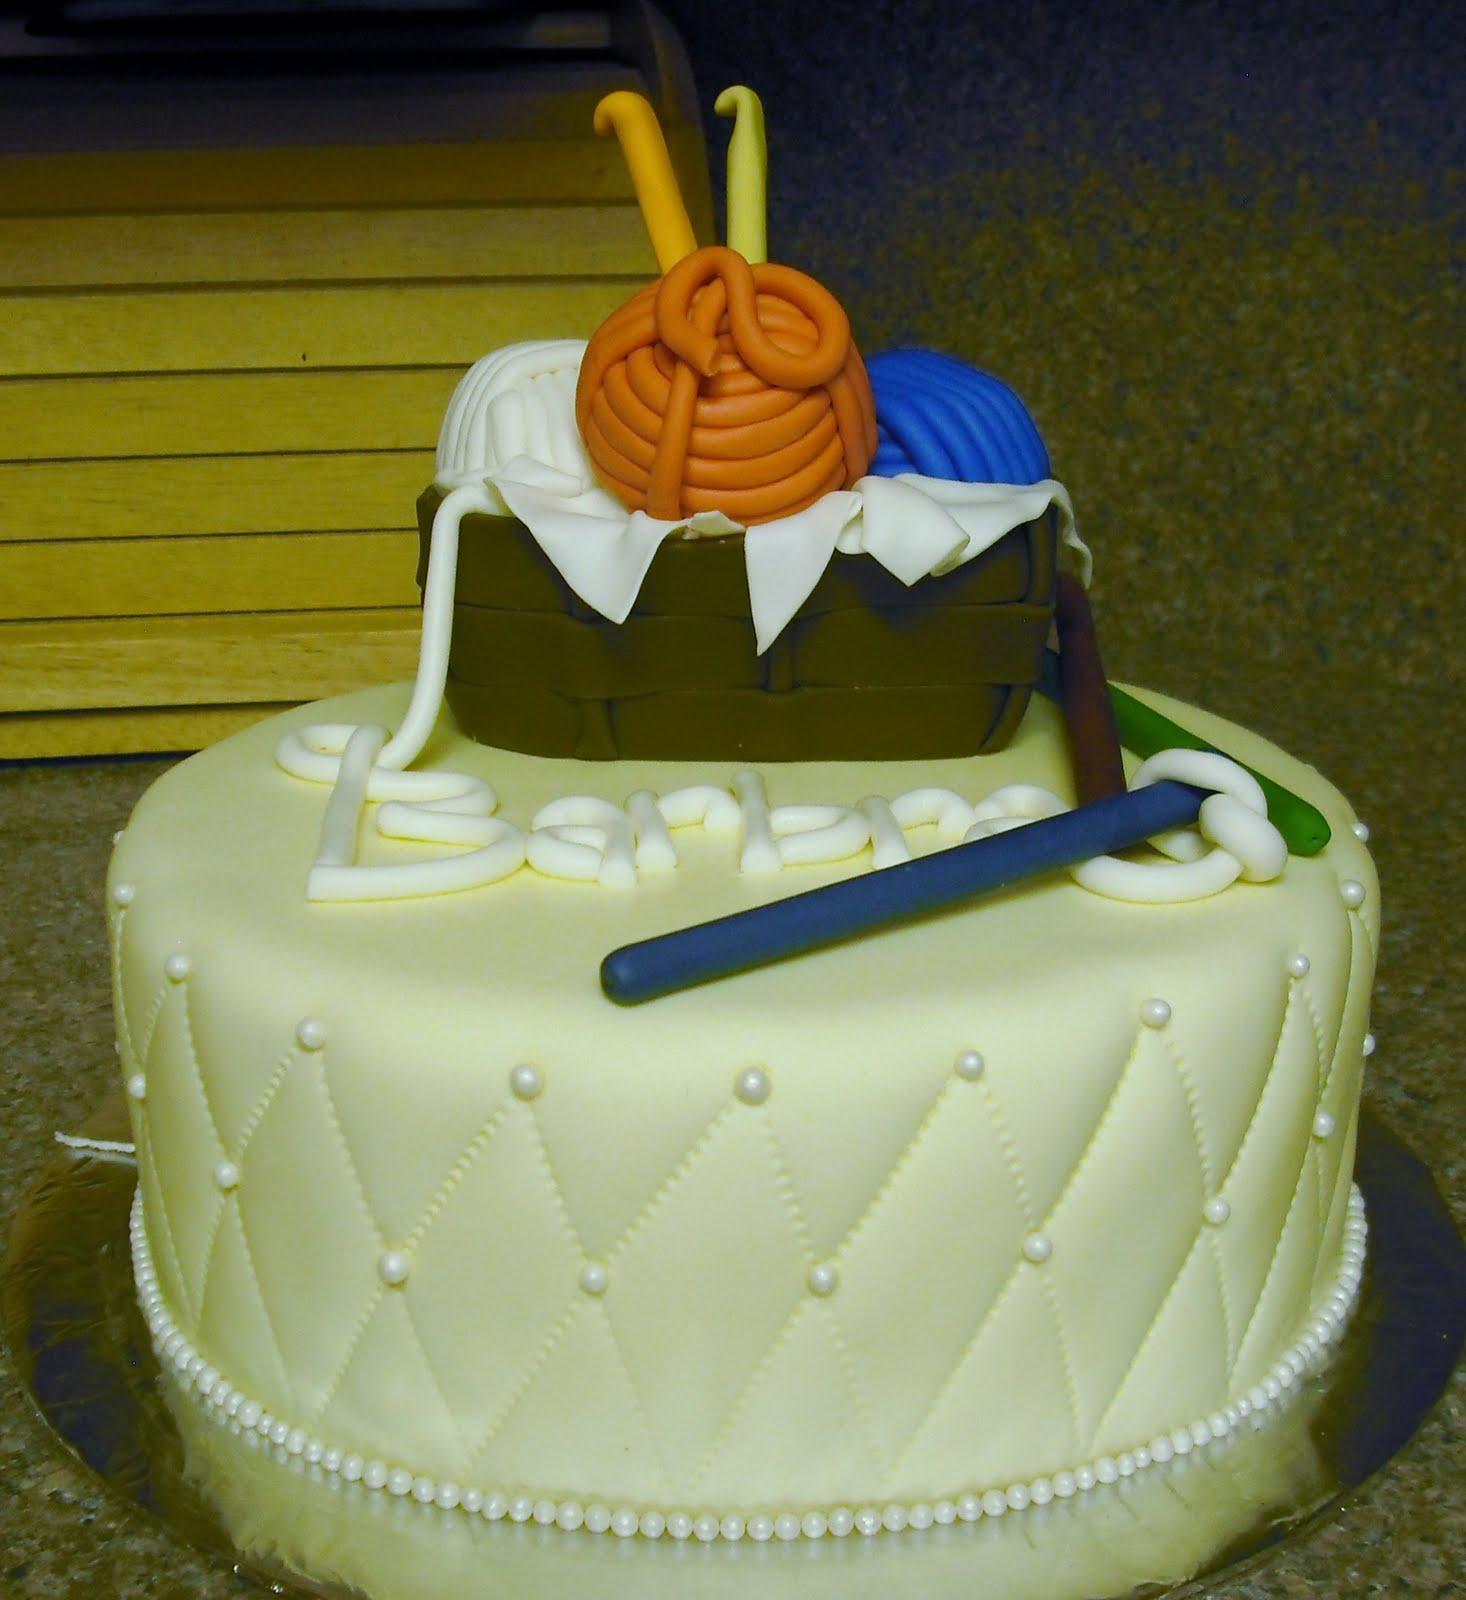 Retirement Cake Clip Art : Enjoy Your Retirement Cake Ideas and Designs